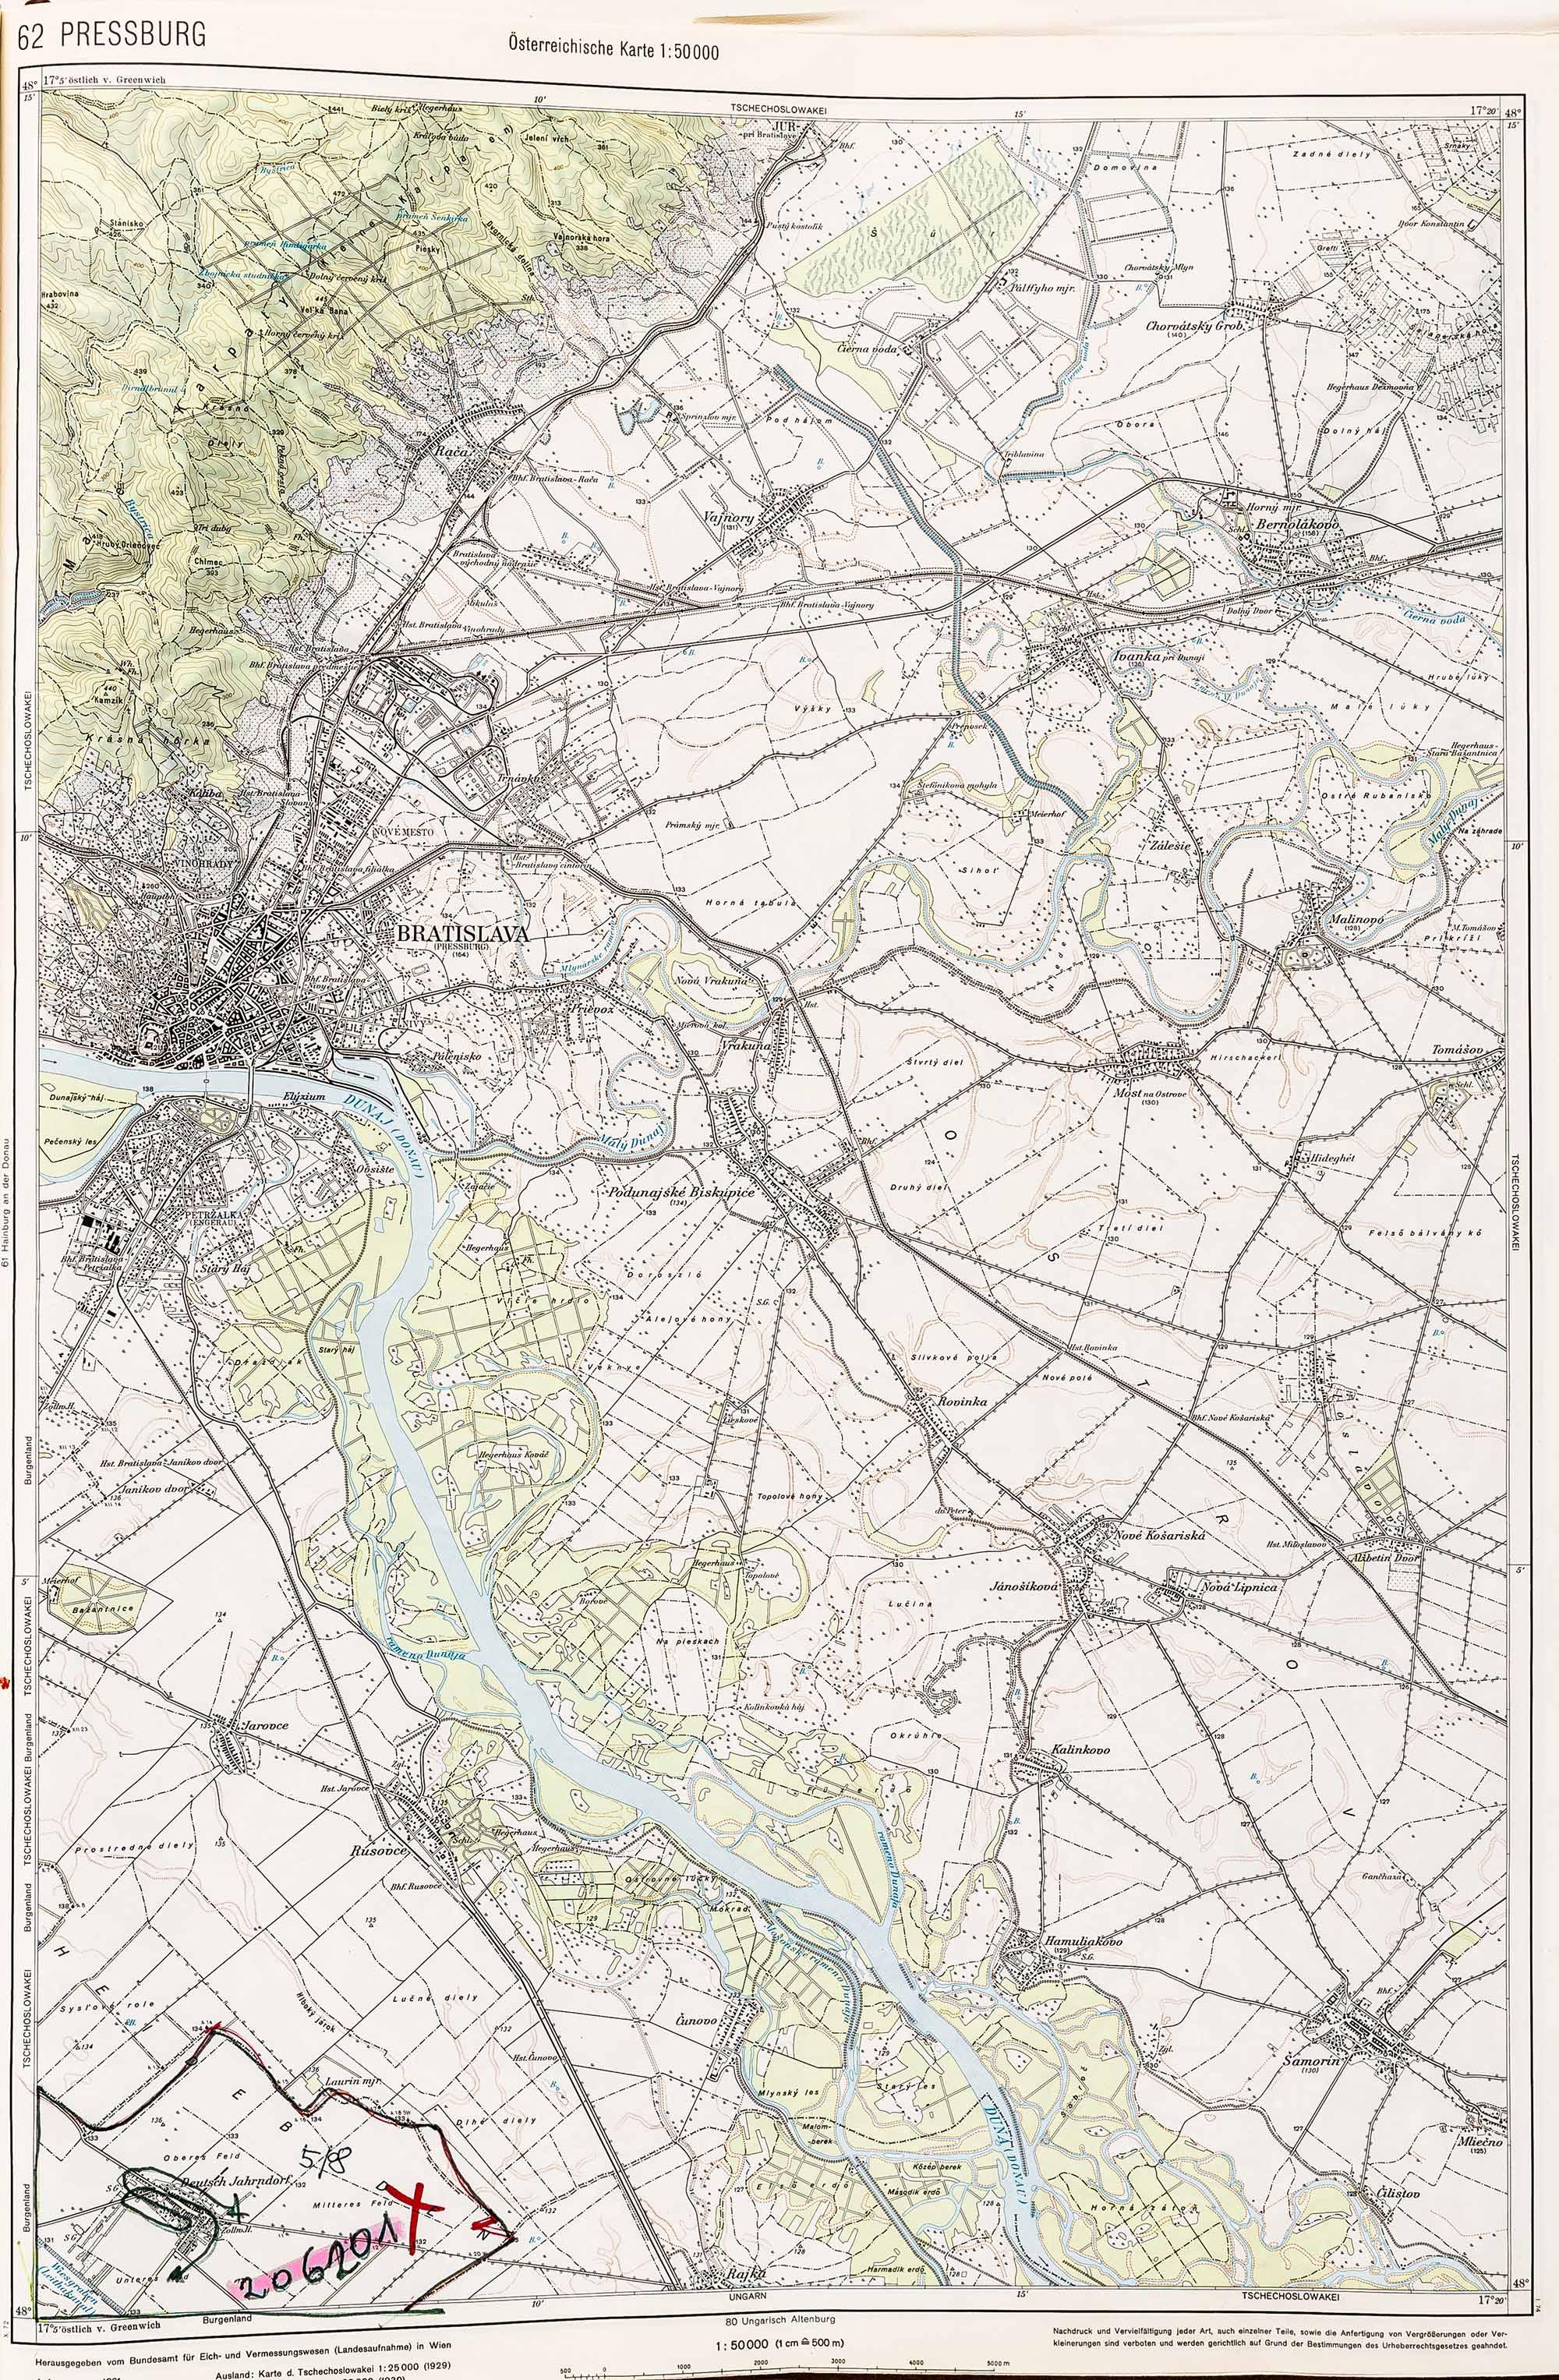 1979-1982 Karte 062